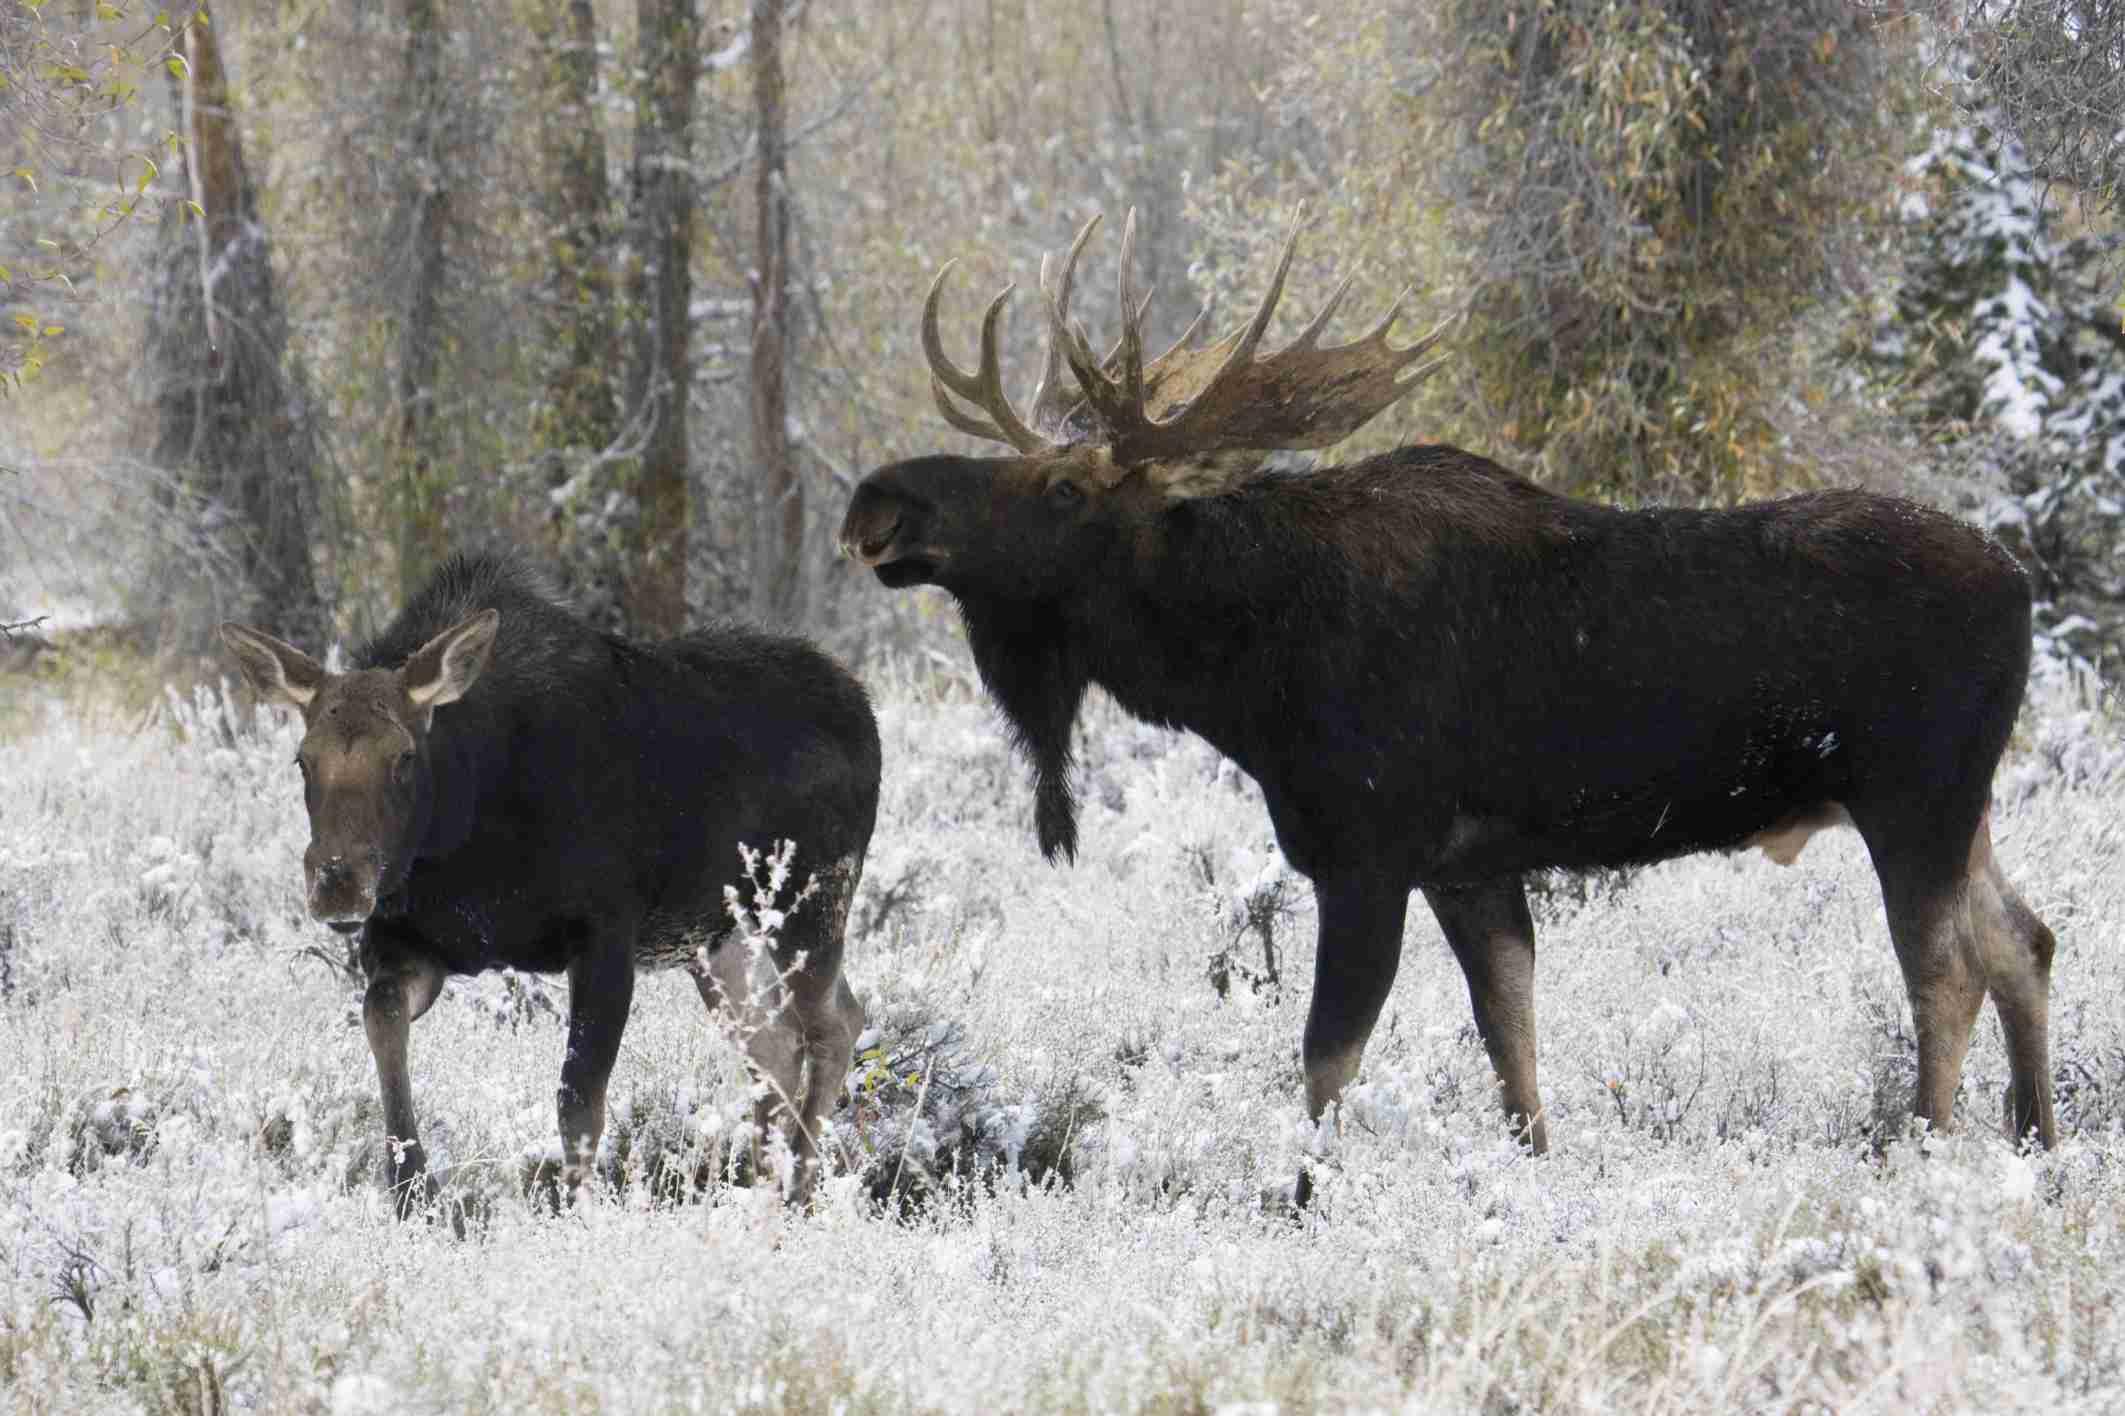 Shiras bull moose (Alces alces shirasi) courting cow moose in snowy Grand Teton National Park, Wyo.